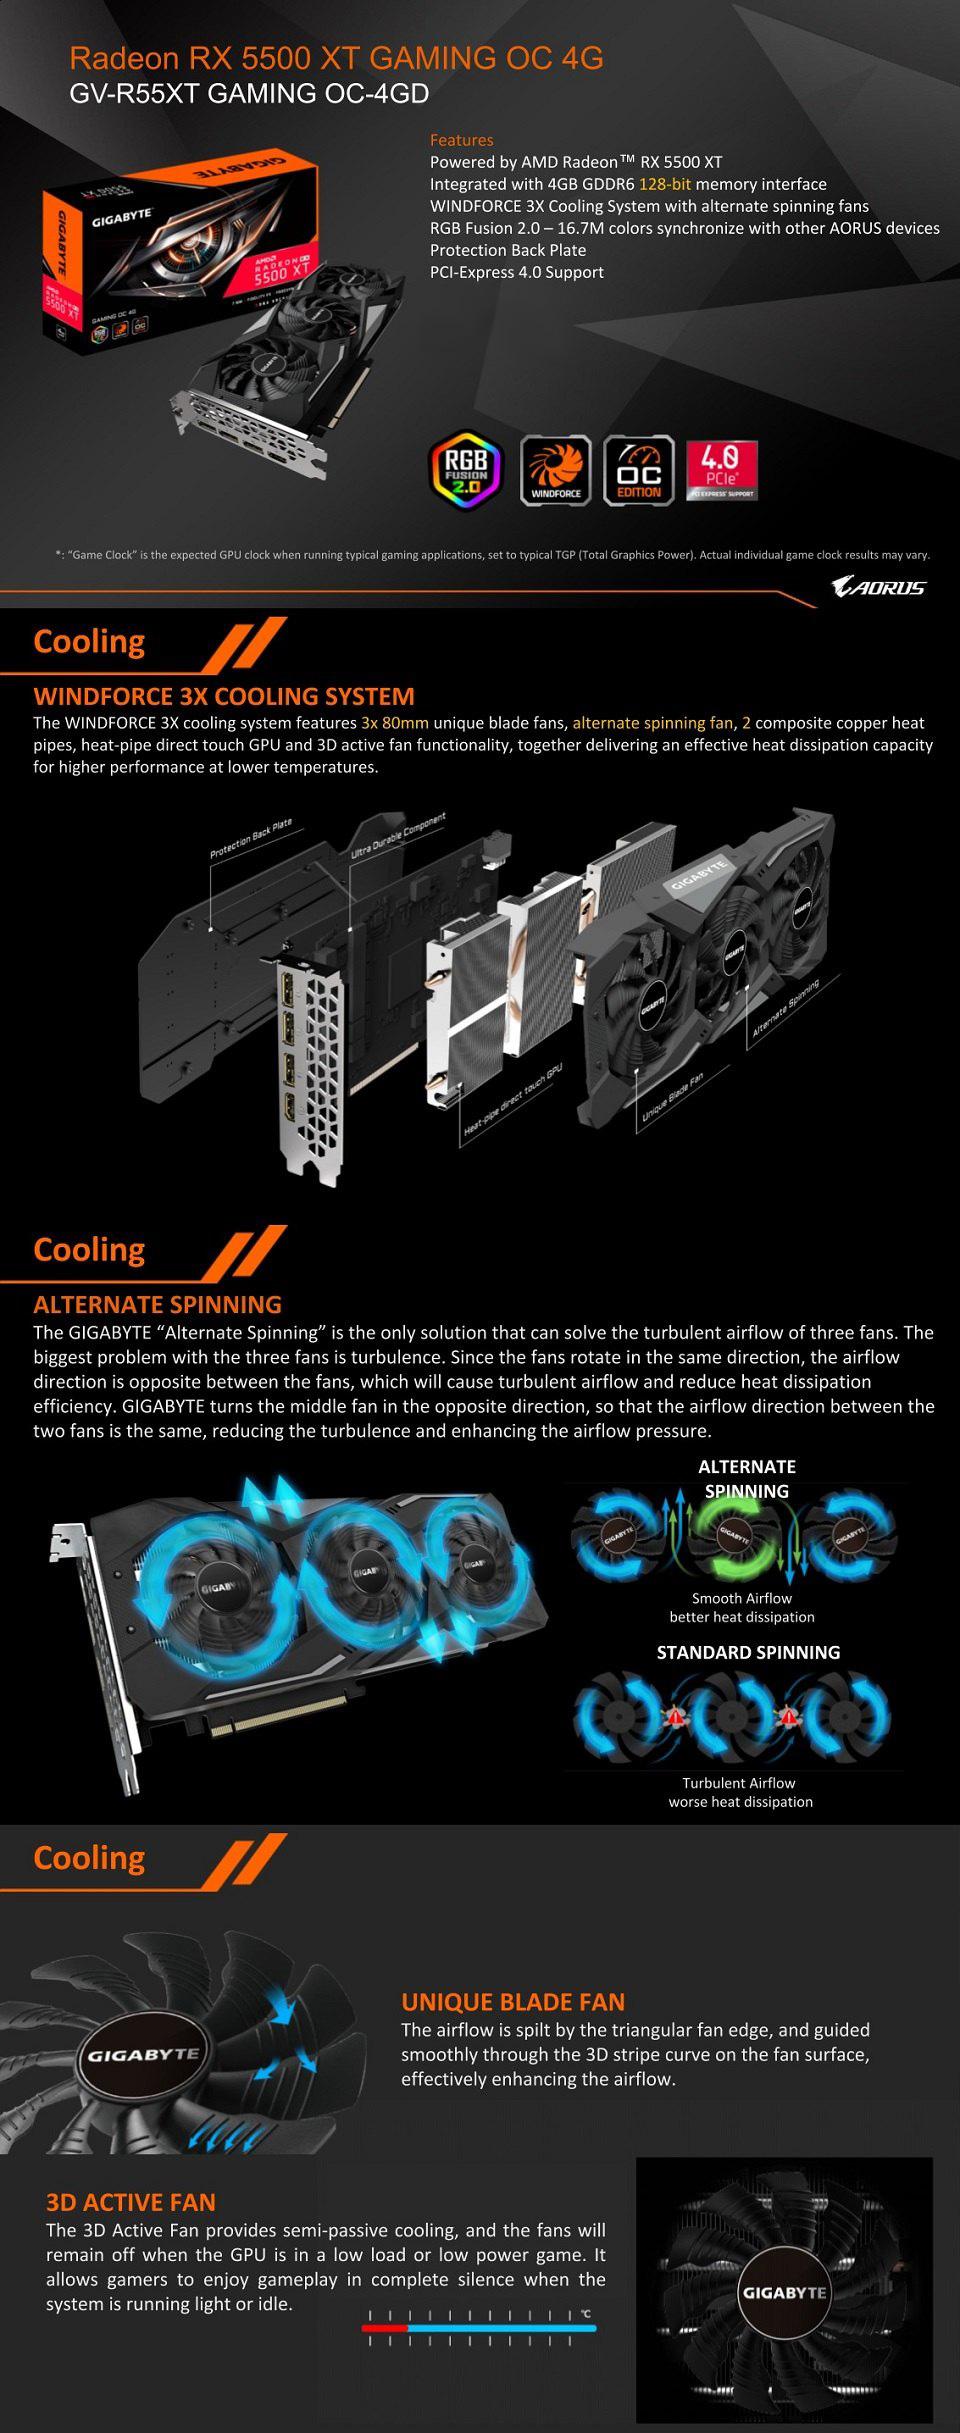 Gigabyte Radeon RX 5500 XT Gaming OC 4GB features